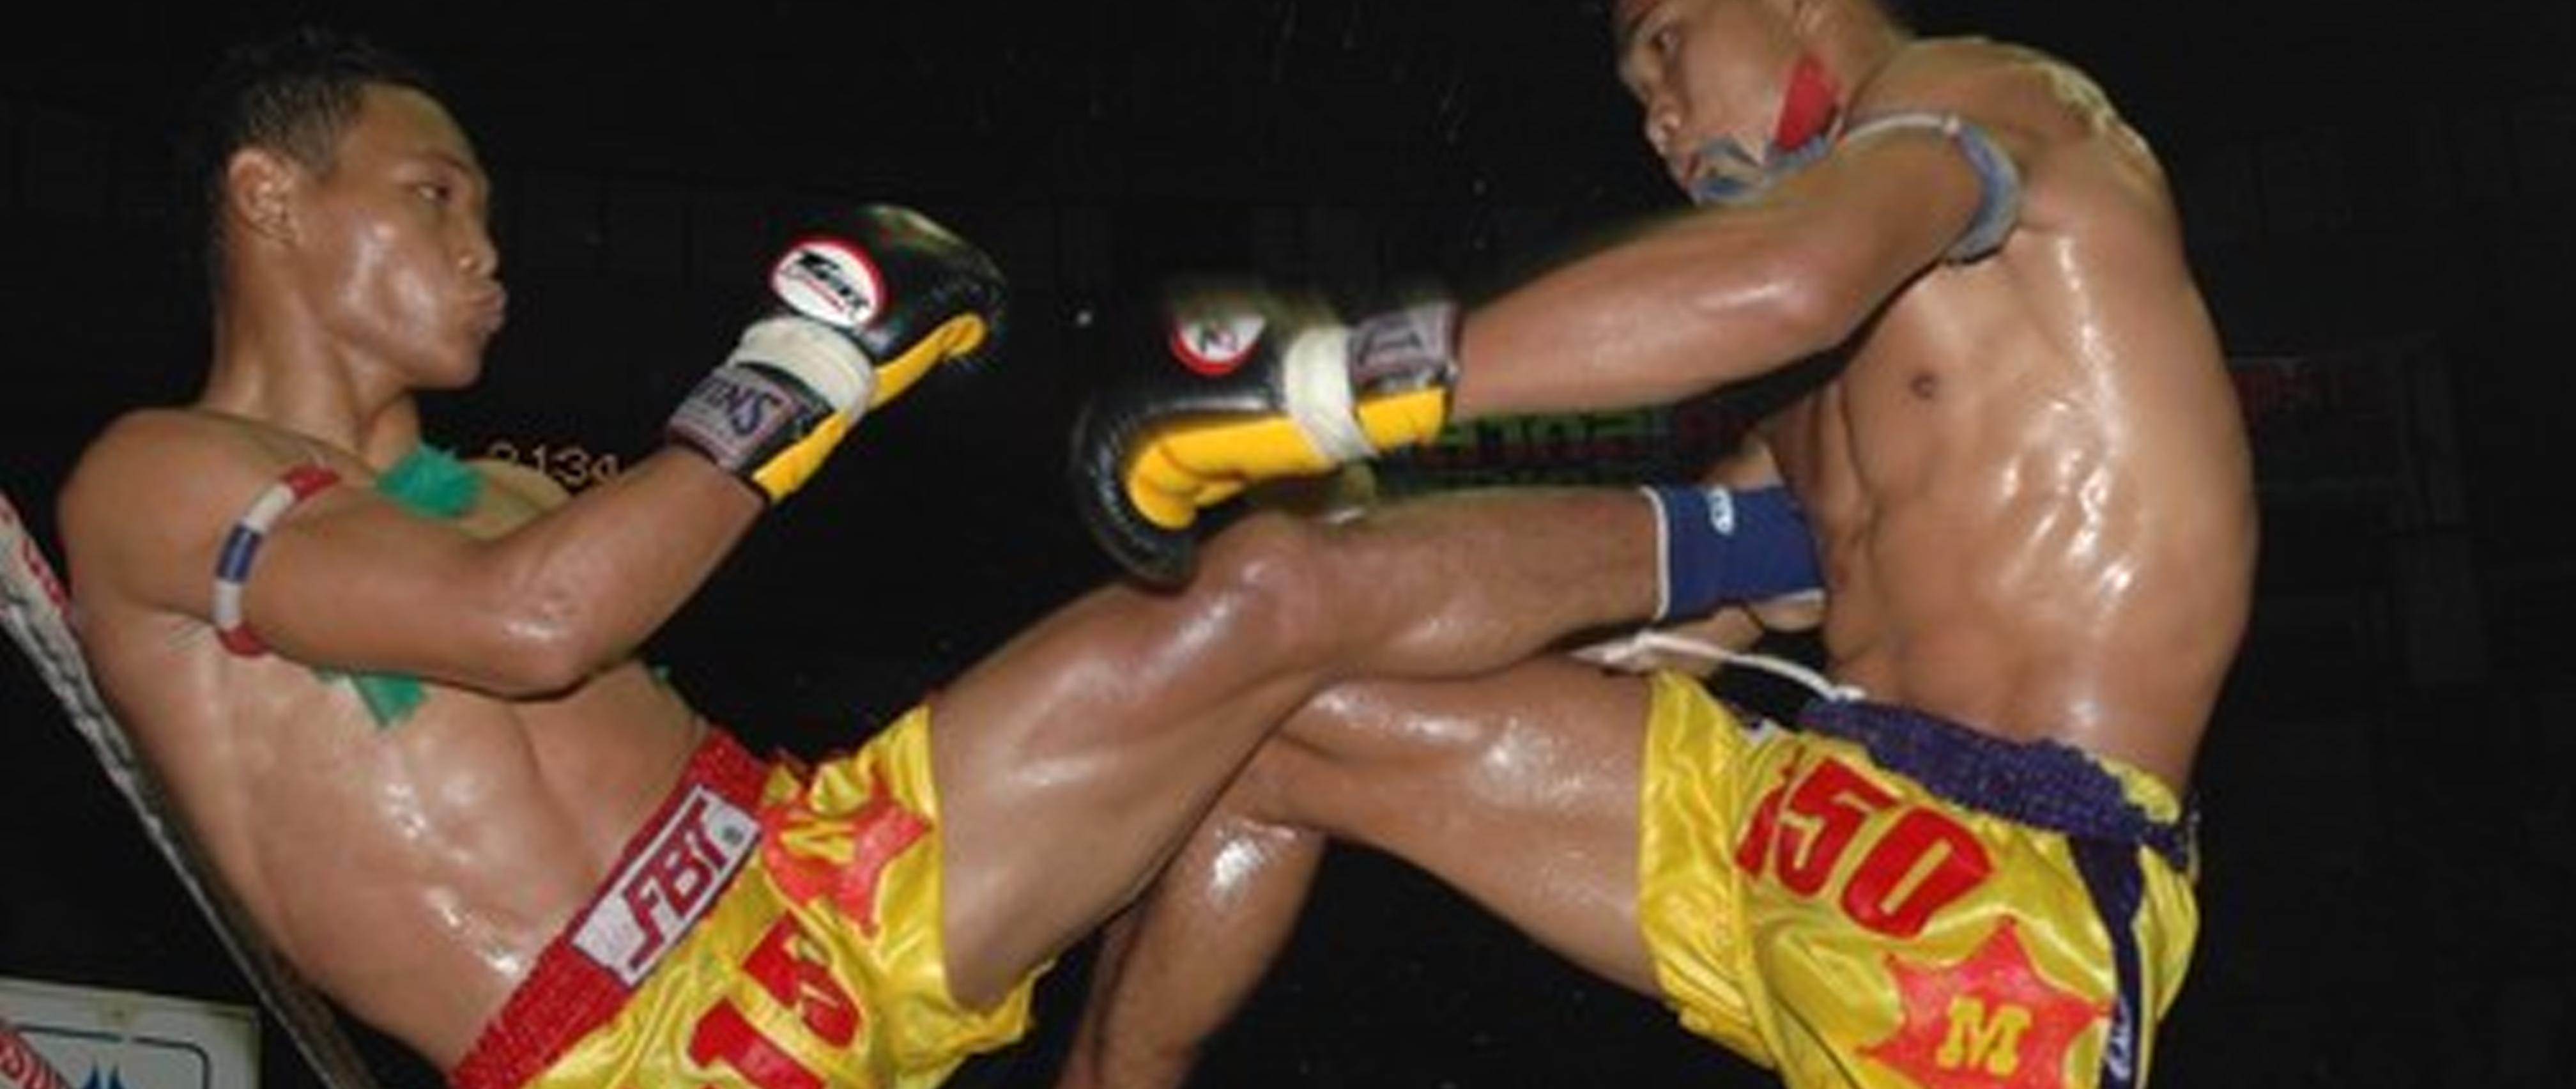 Muai-Thai Thaiboxen Kampfsport